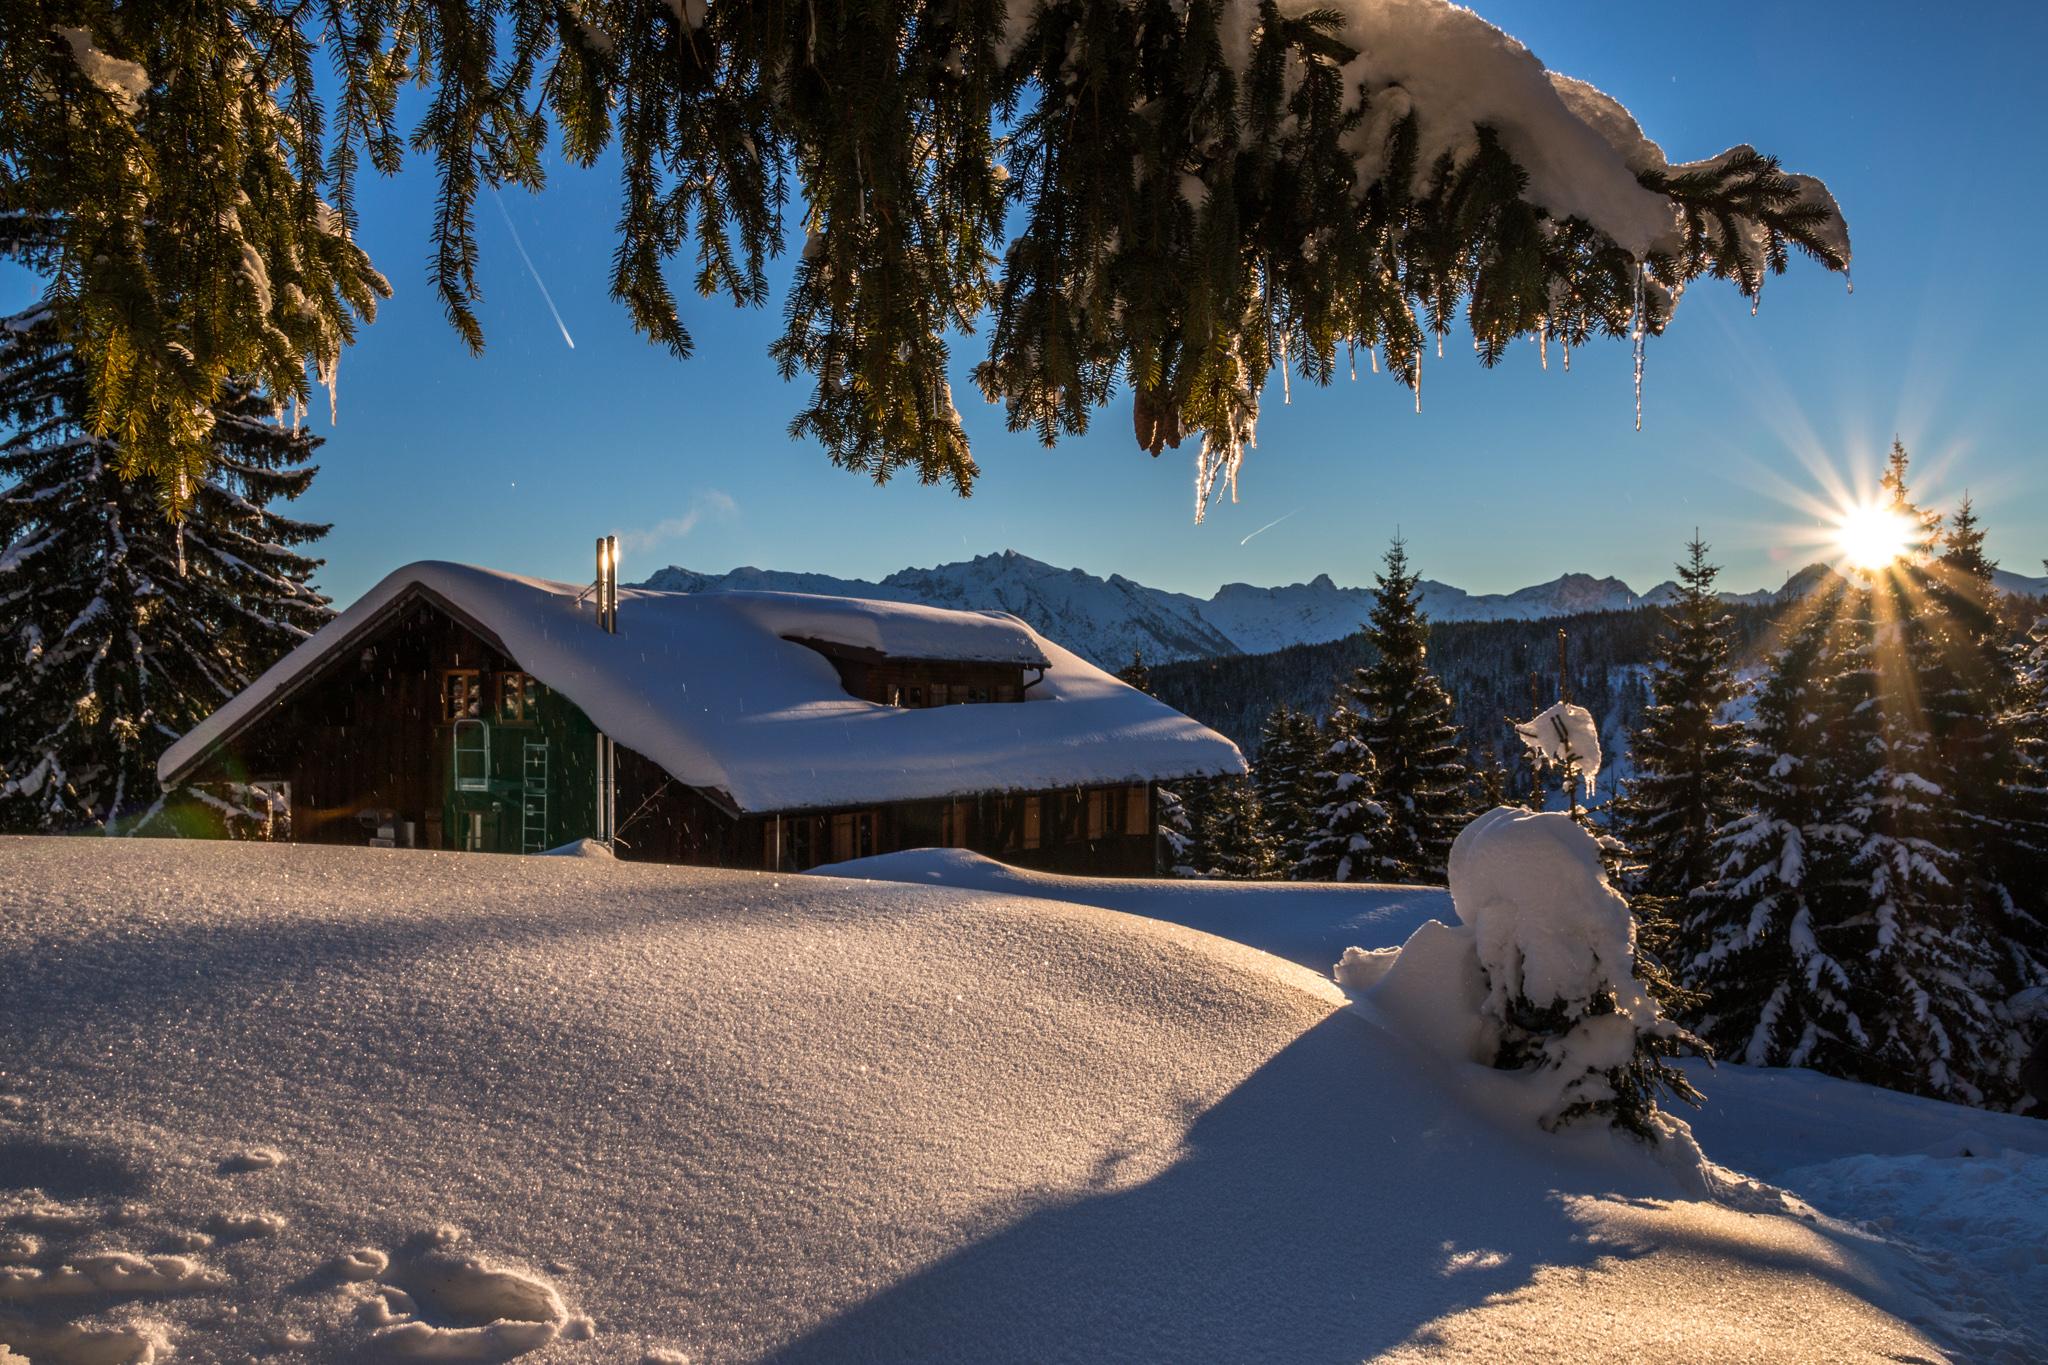 Wannenkopfhütte, Oberallgäu, Germany